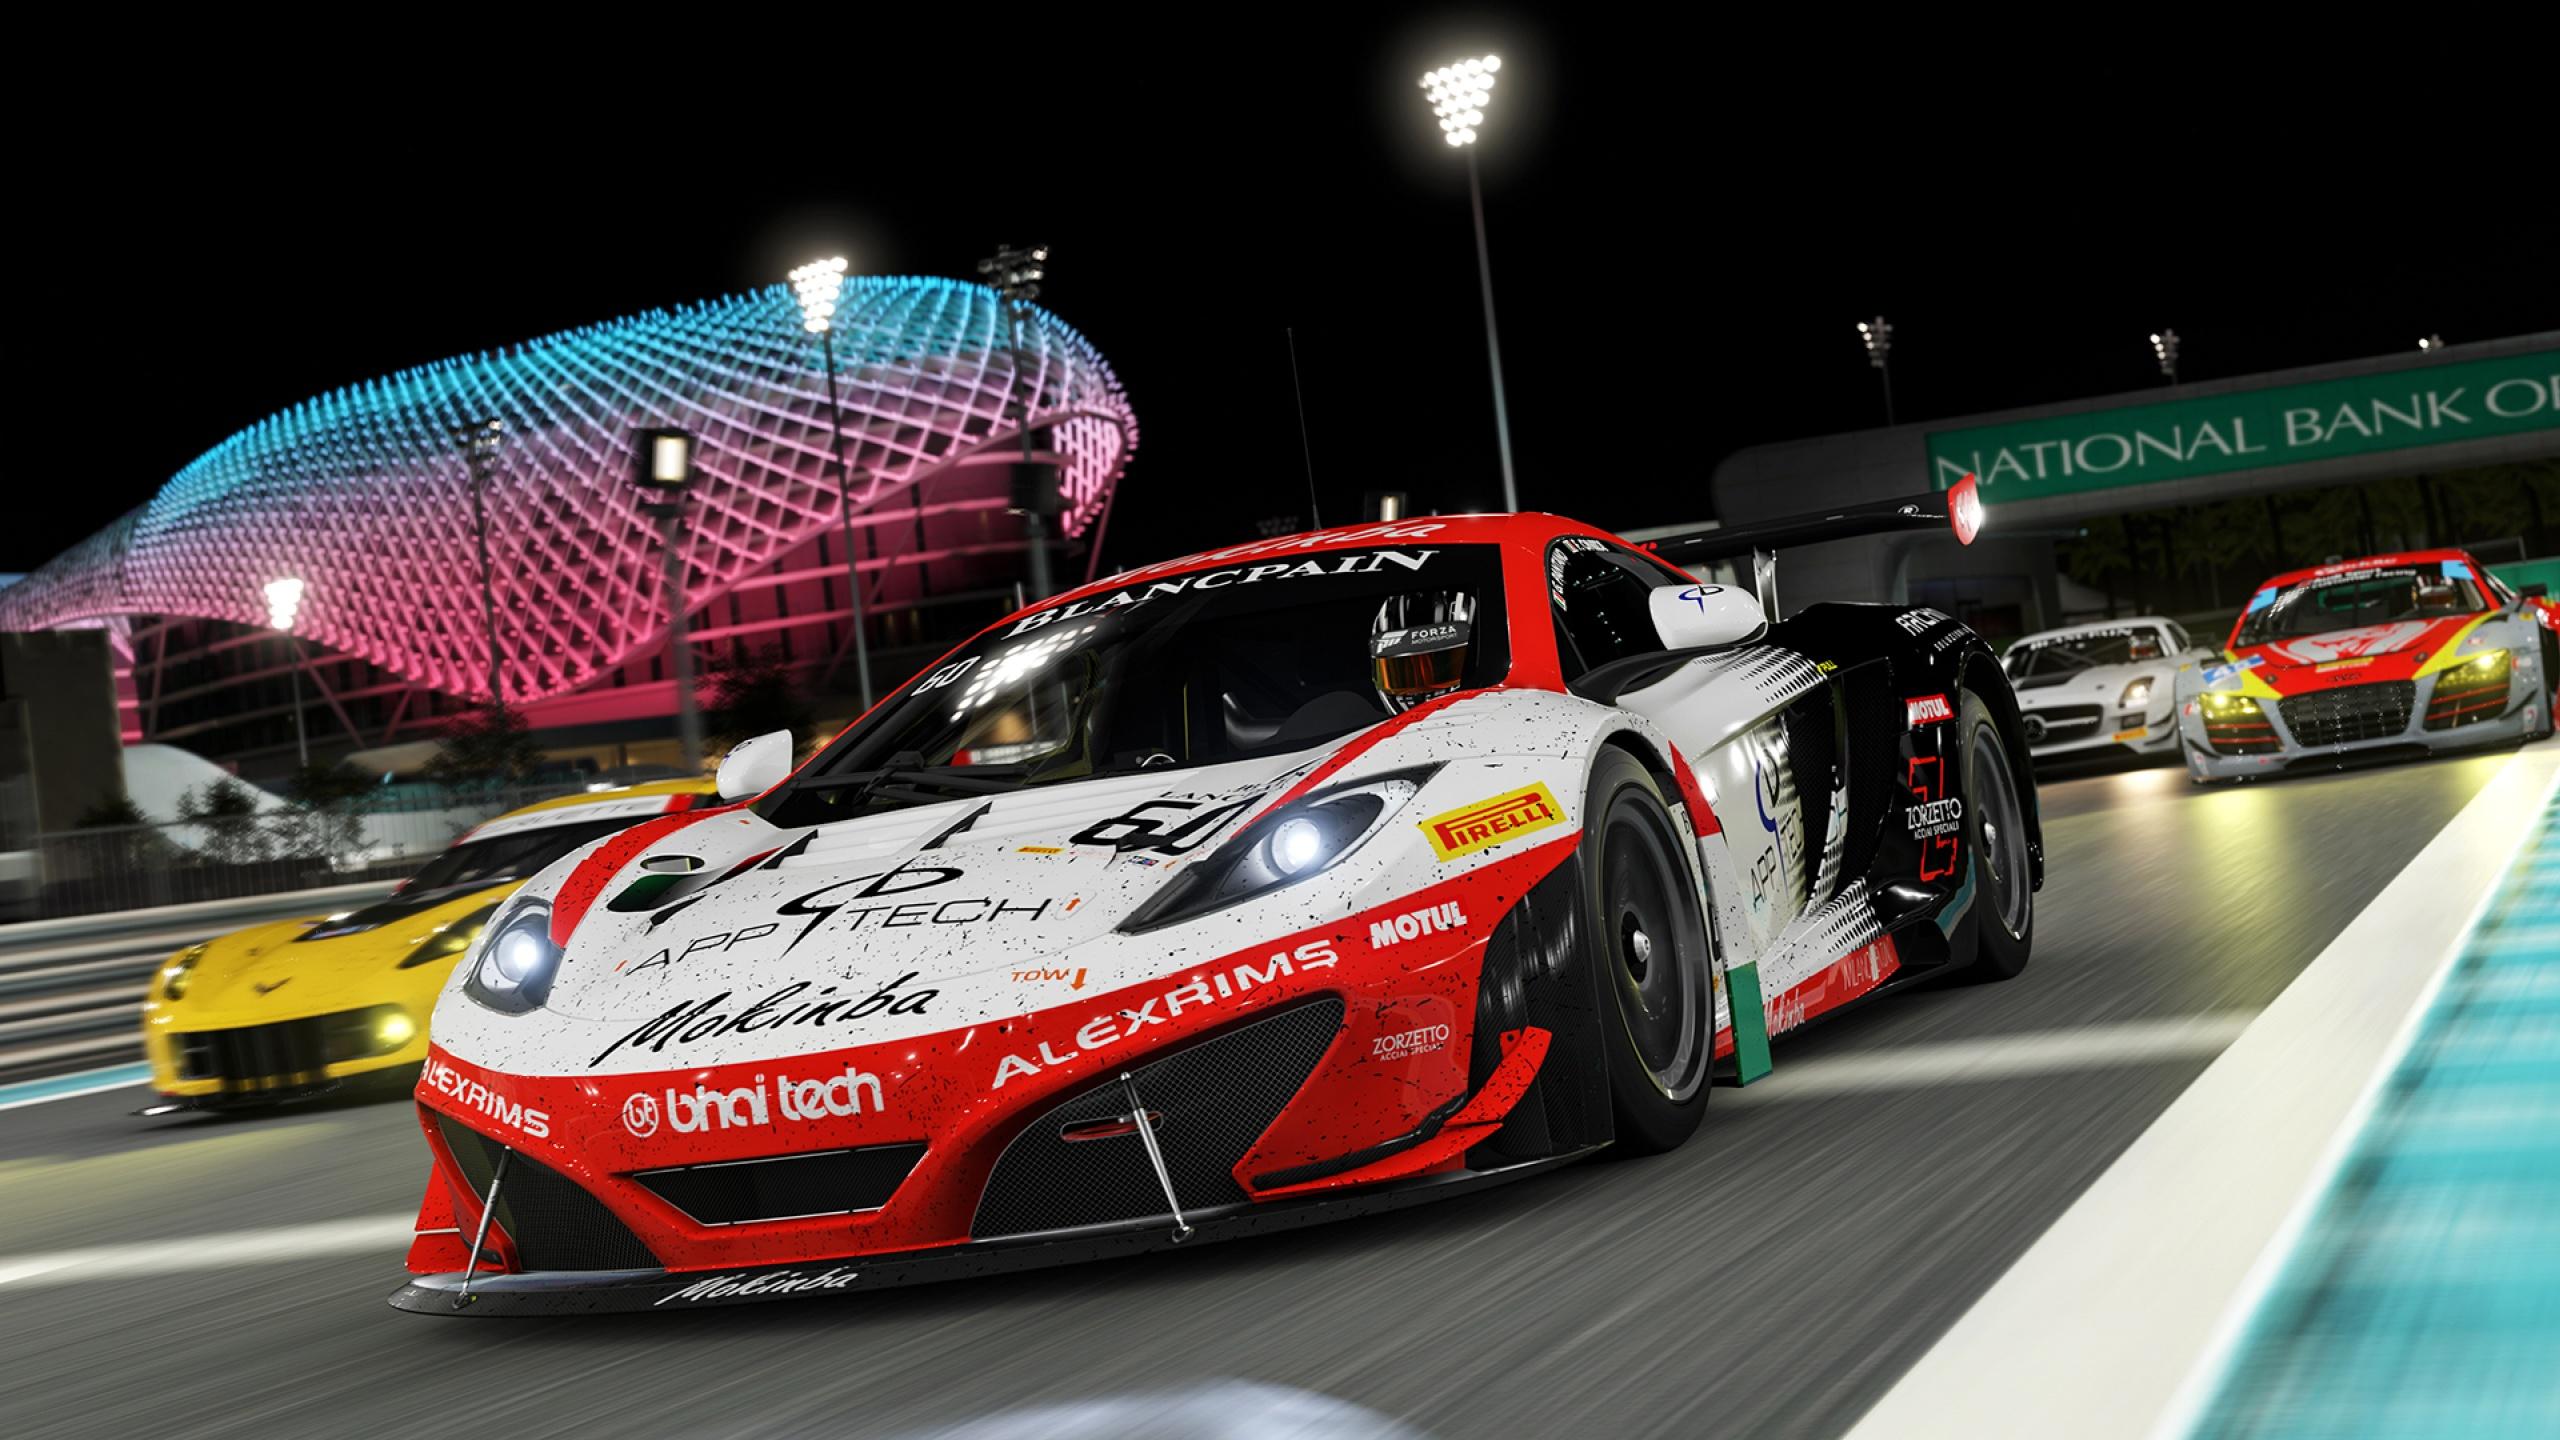 Forza Motorsport Night Race Wallpapers In Jpg Format For Free